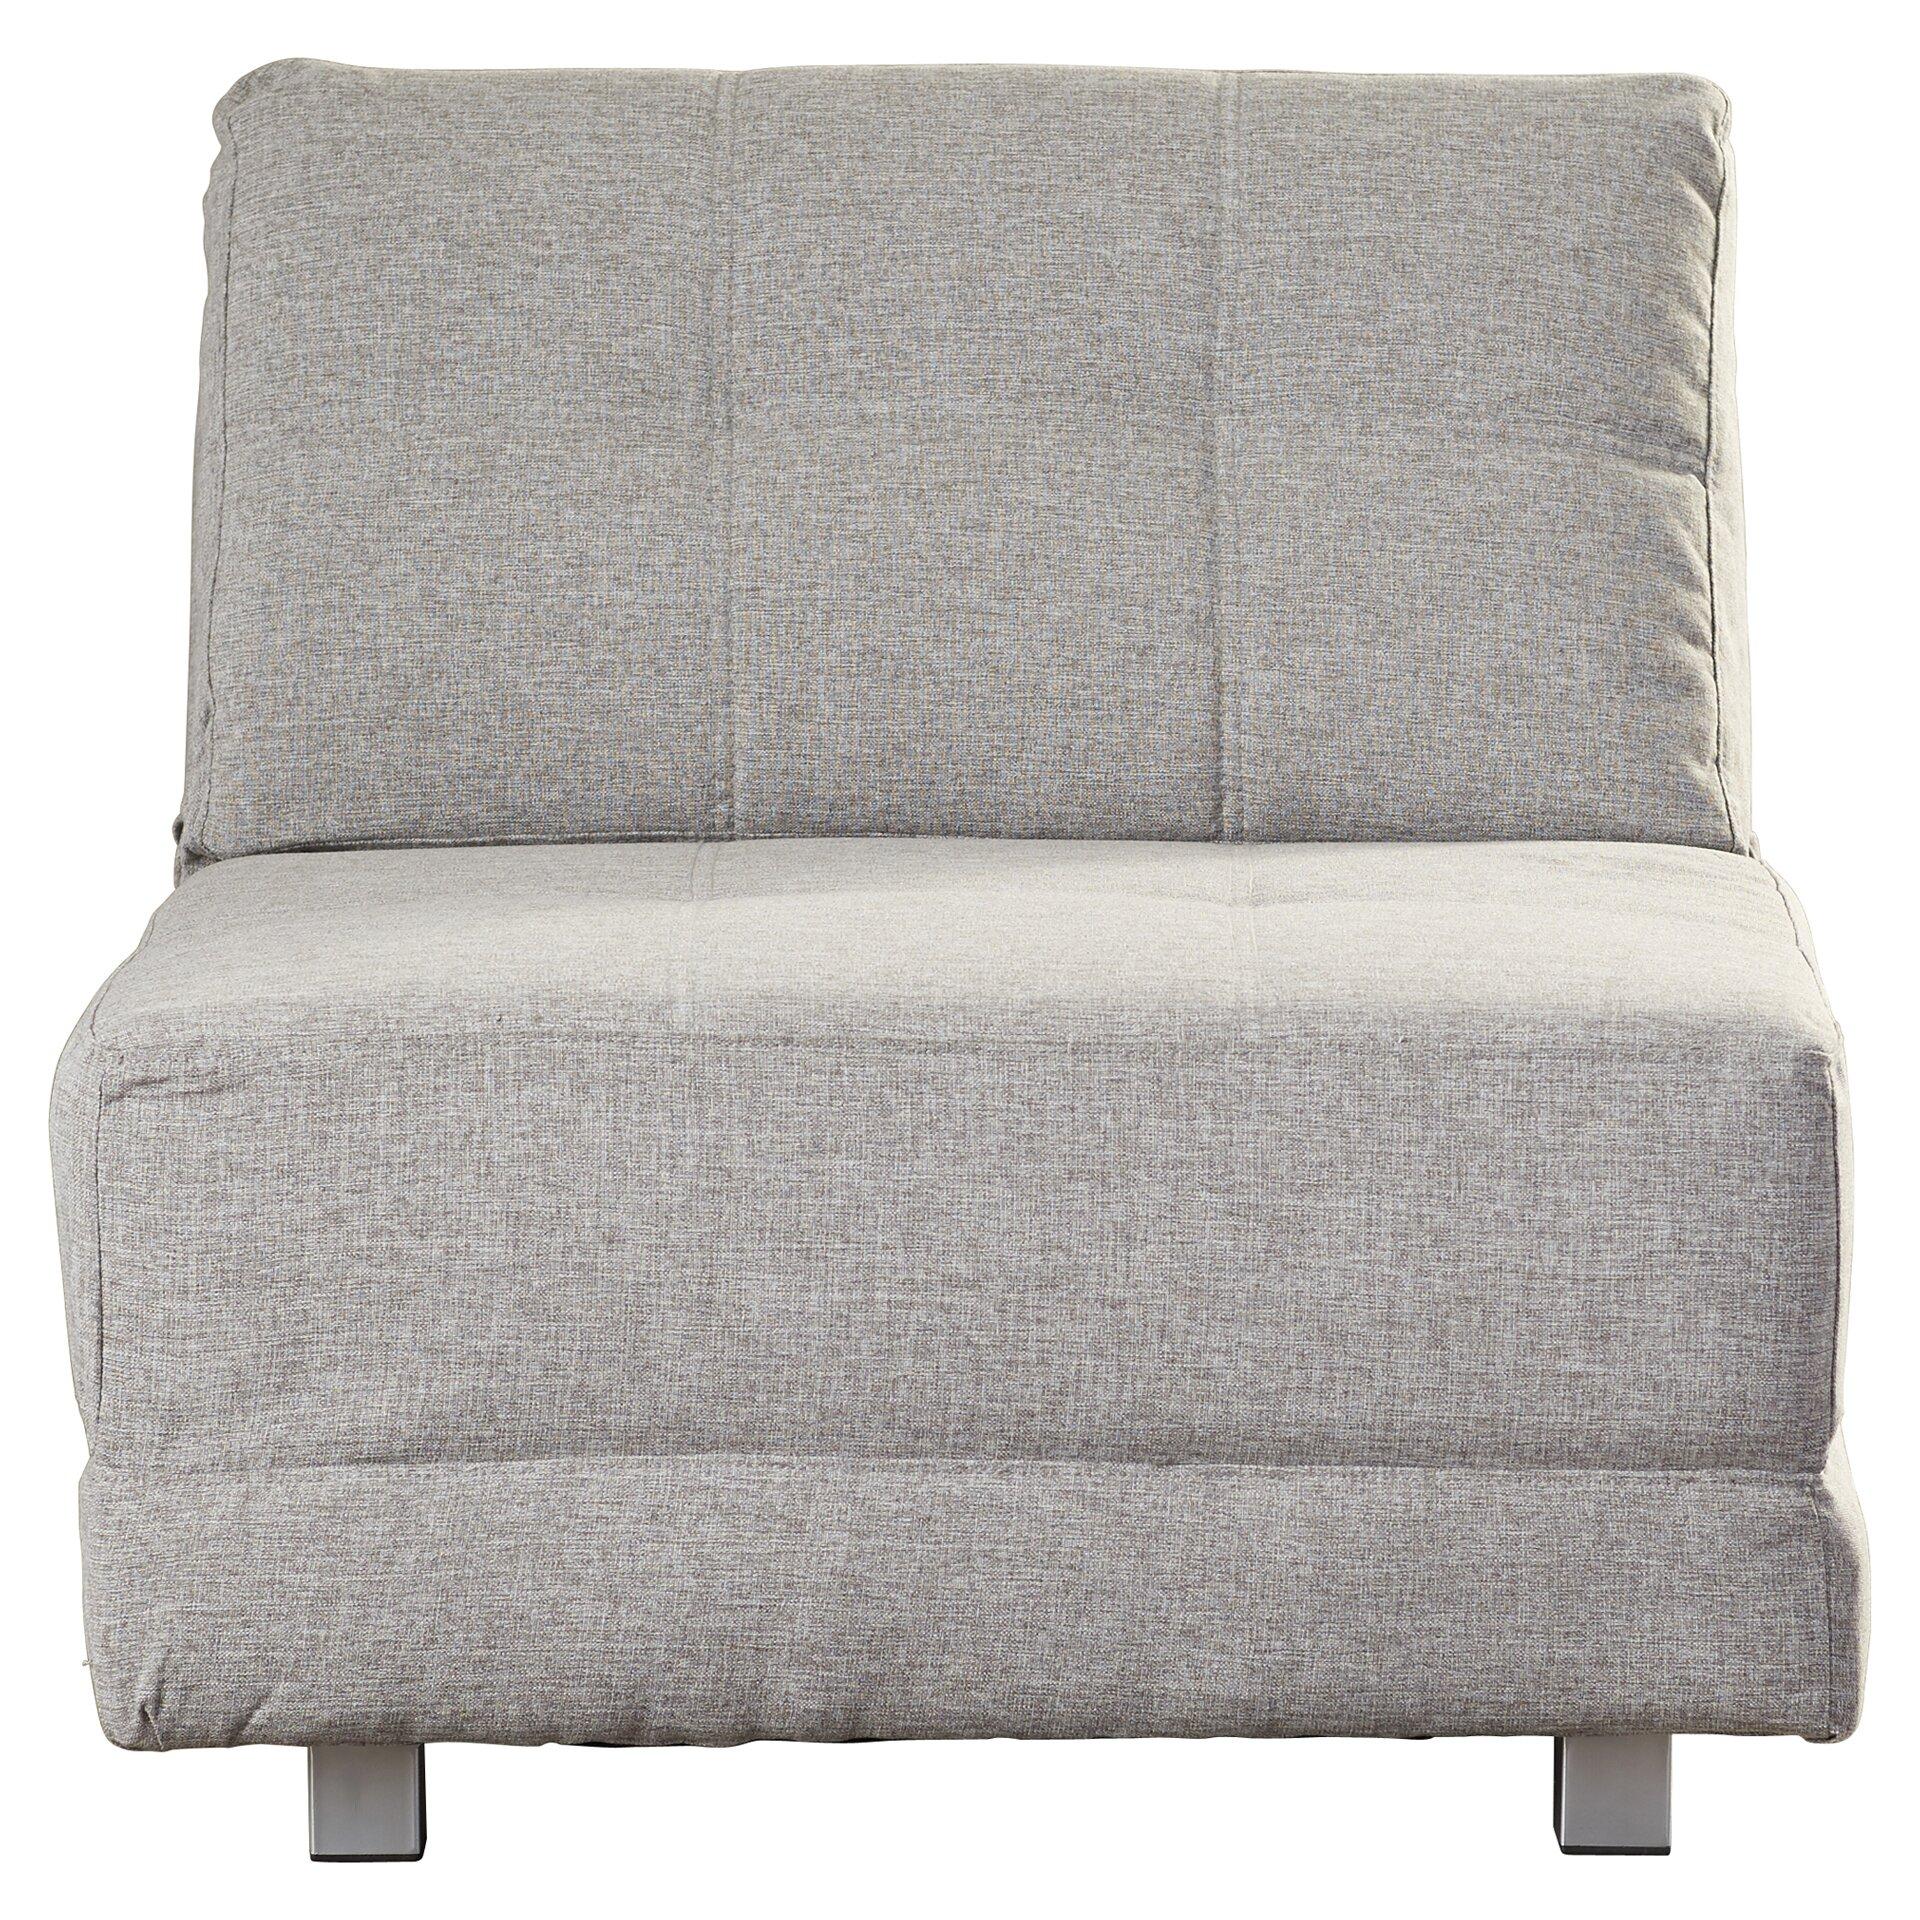 Zipcode Design Krystal Convertible Chair Amp Reviews Wayfair